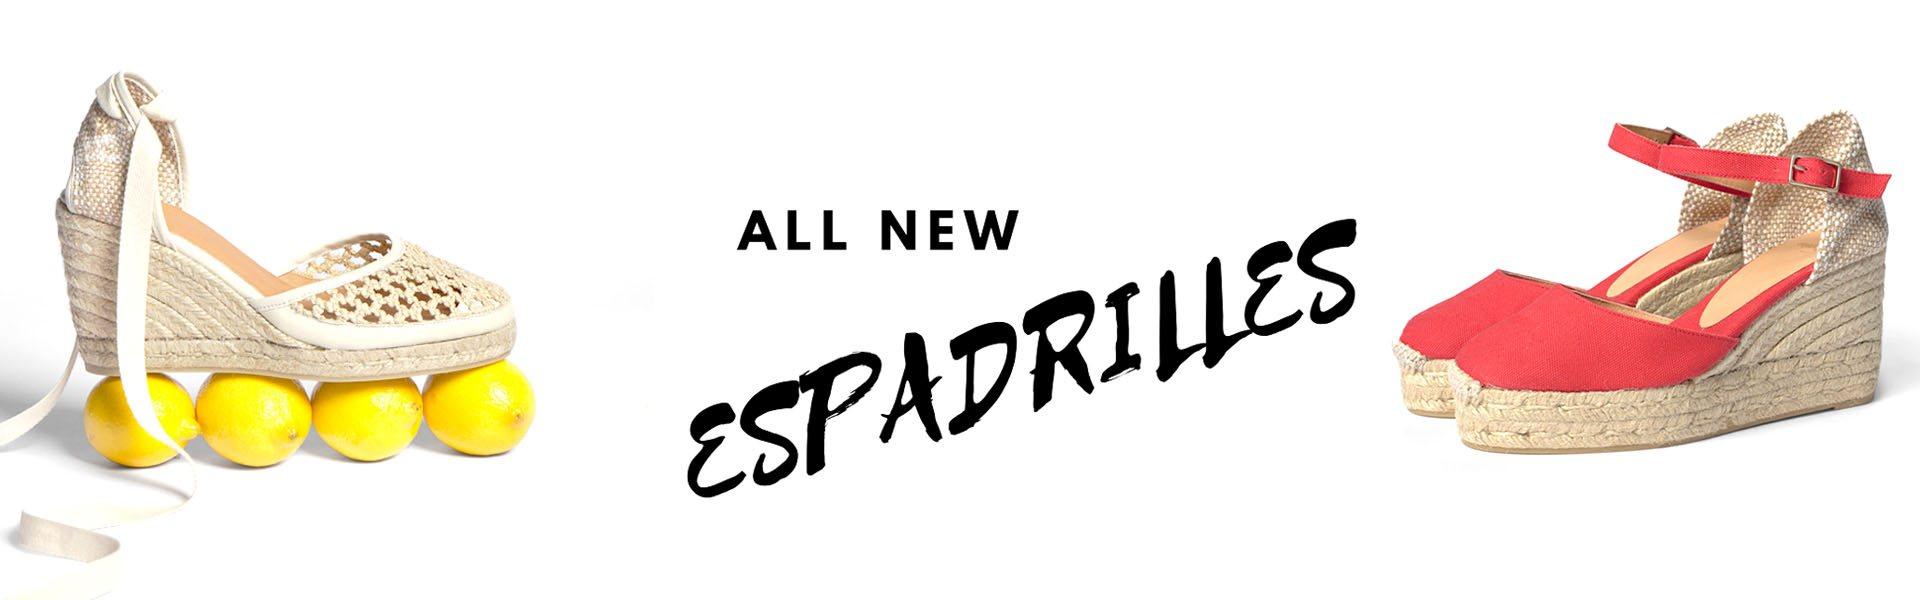 Castaner Espadrilles